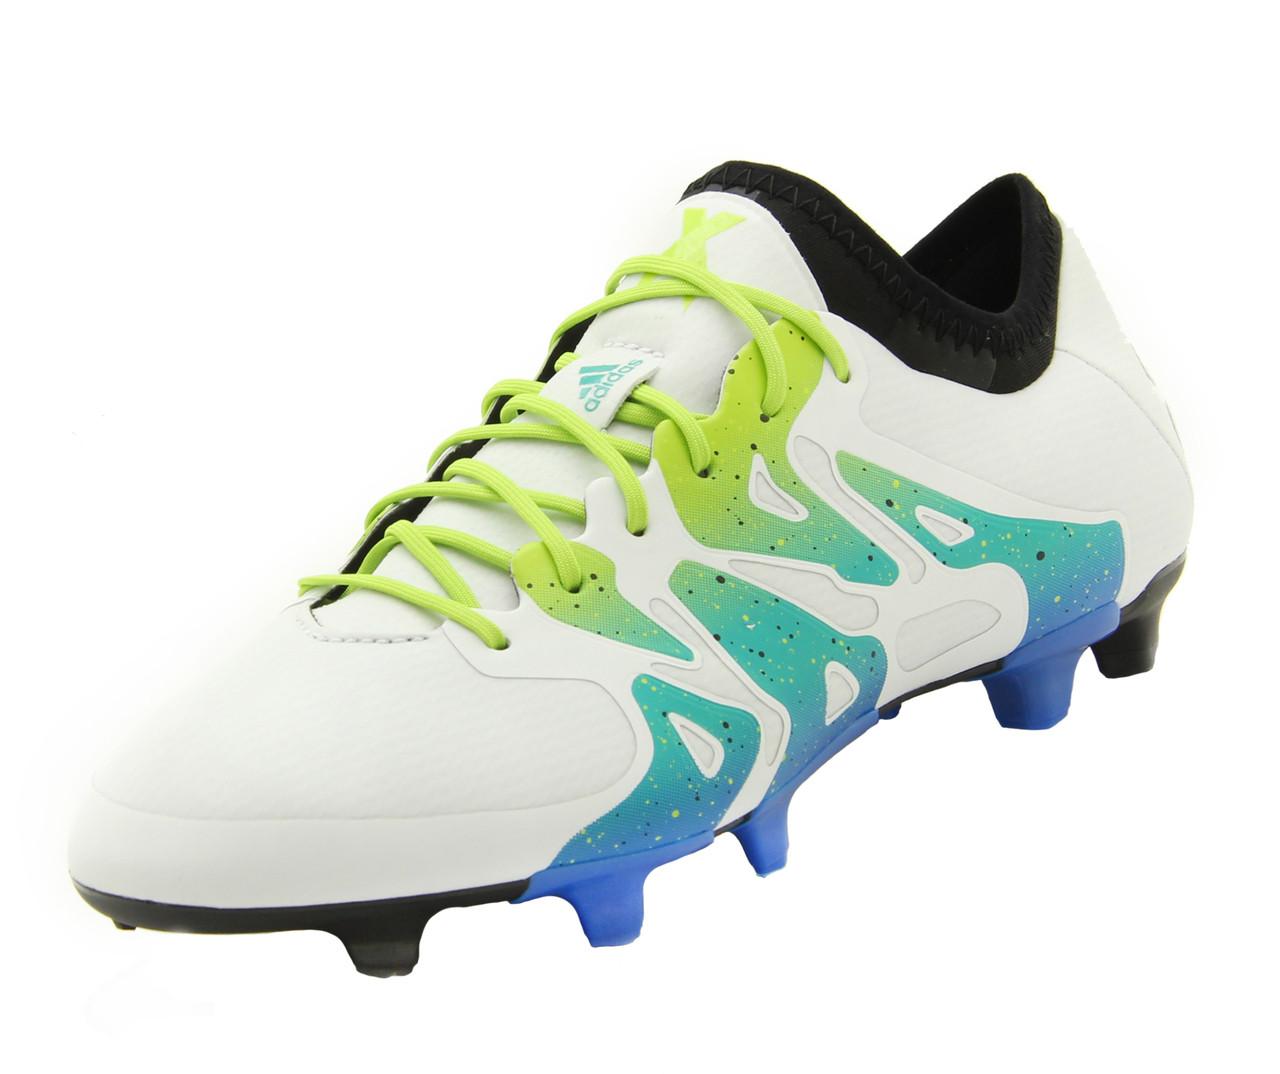 separation shoes e45ce 83971 Adidas X 15.1- White/Semi Solar Slime/Core Black SD (11219)